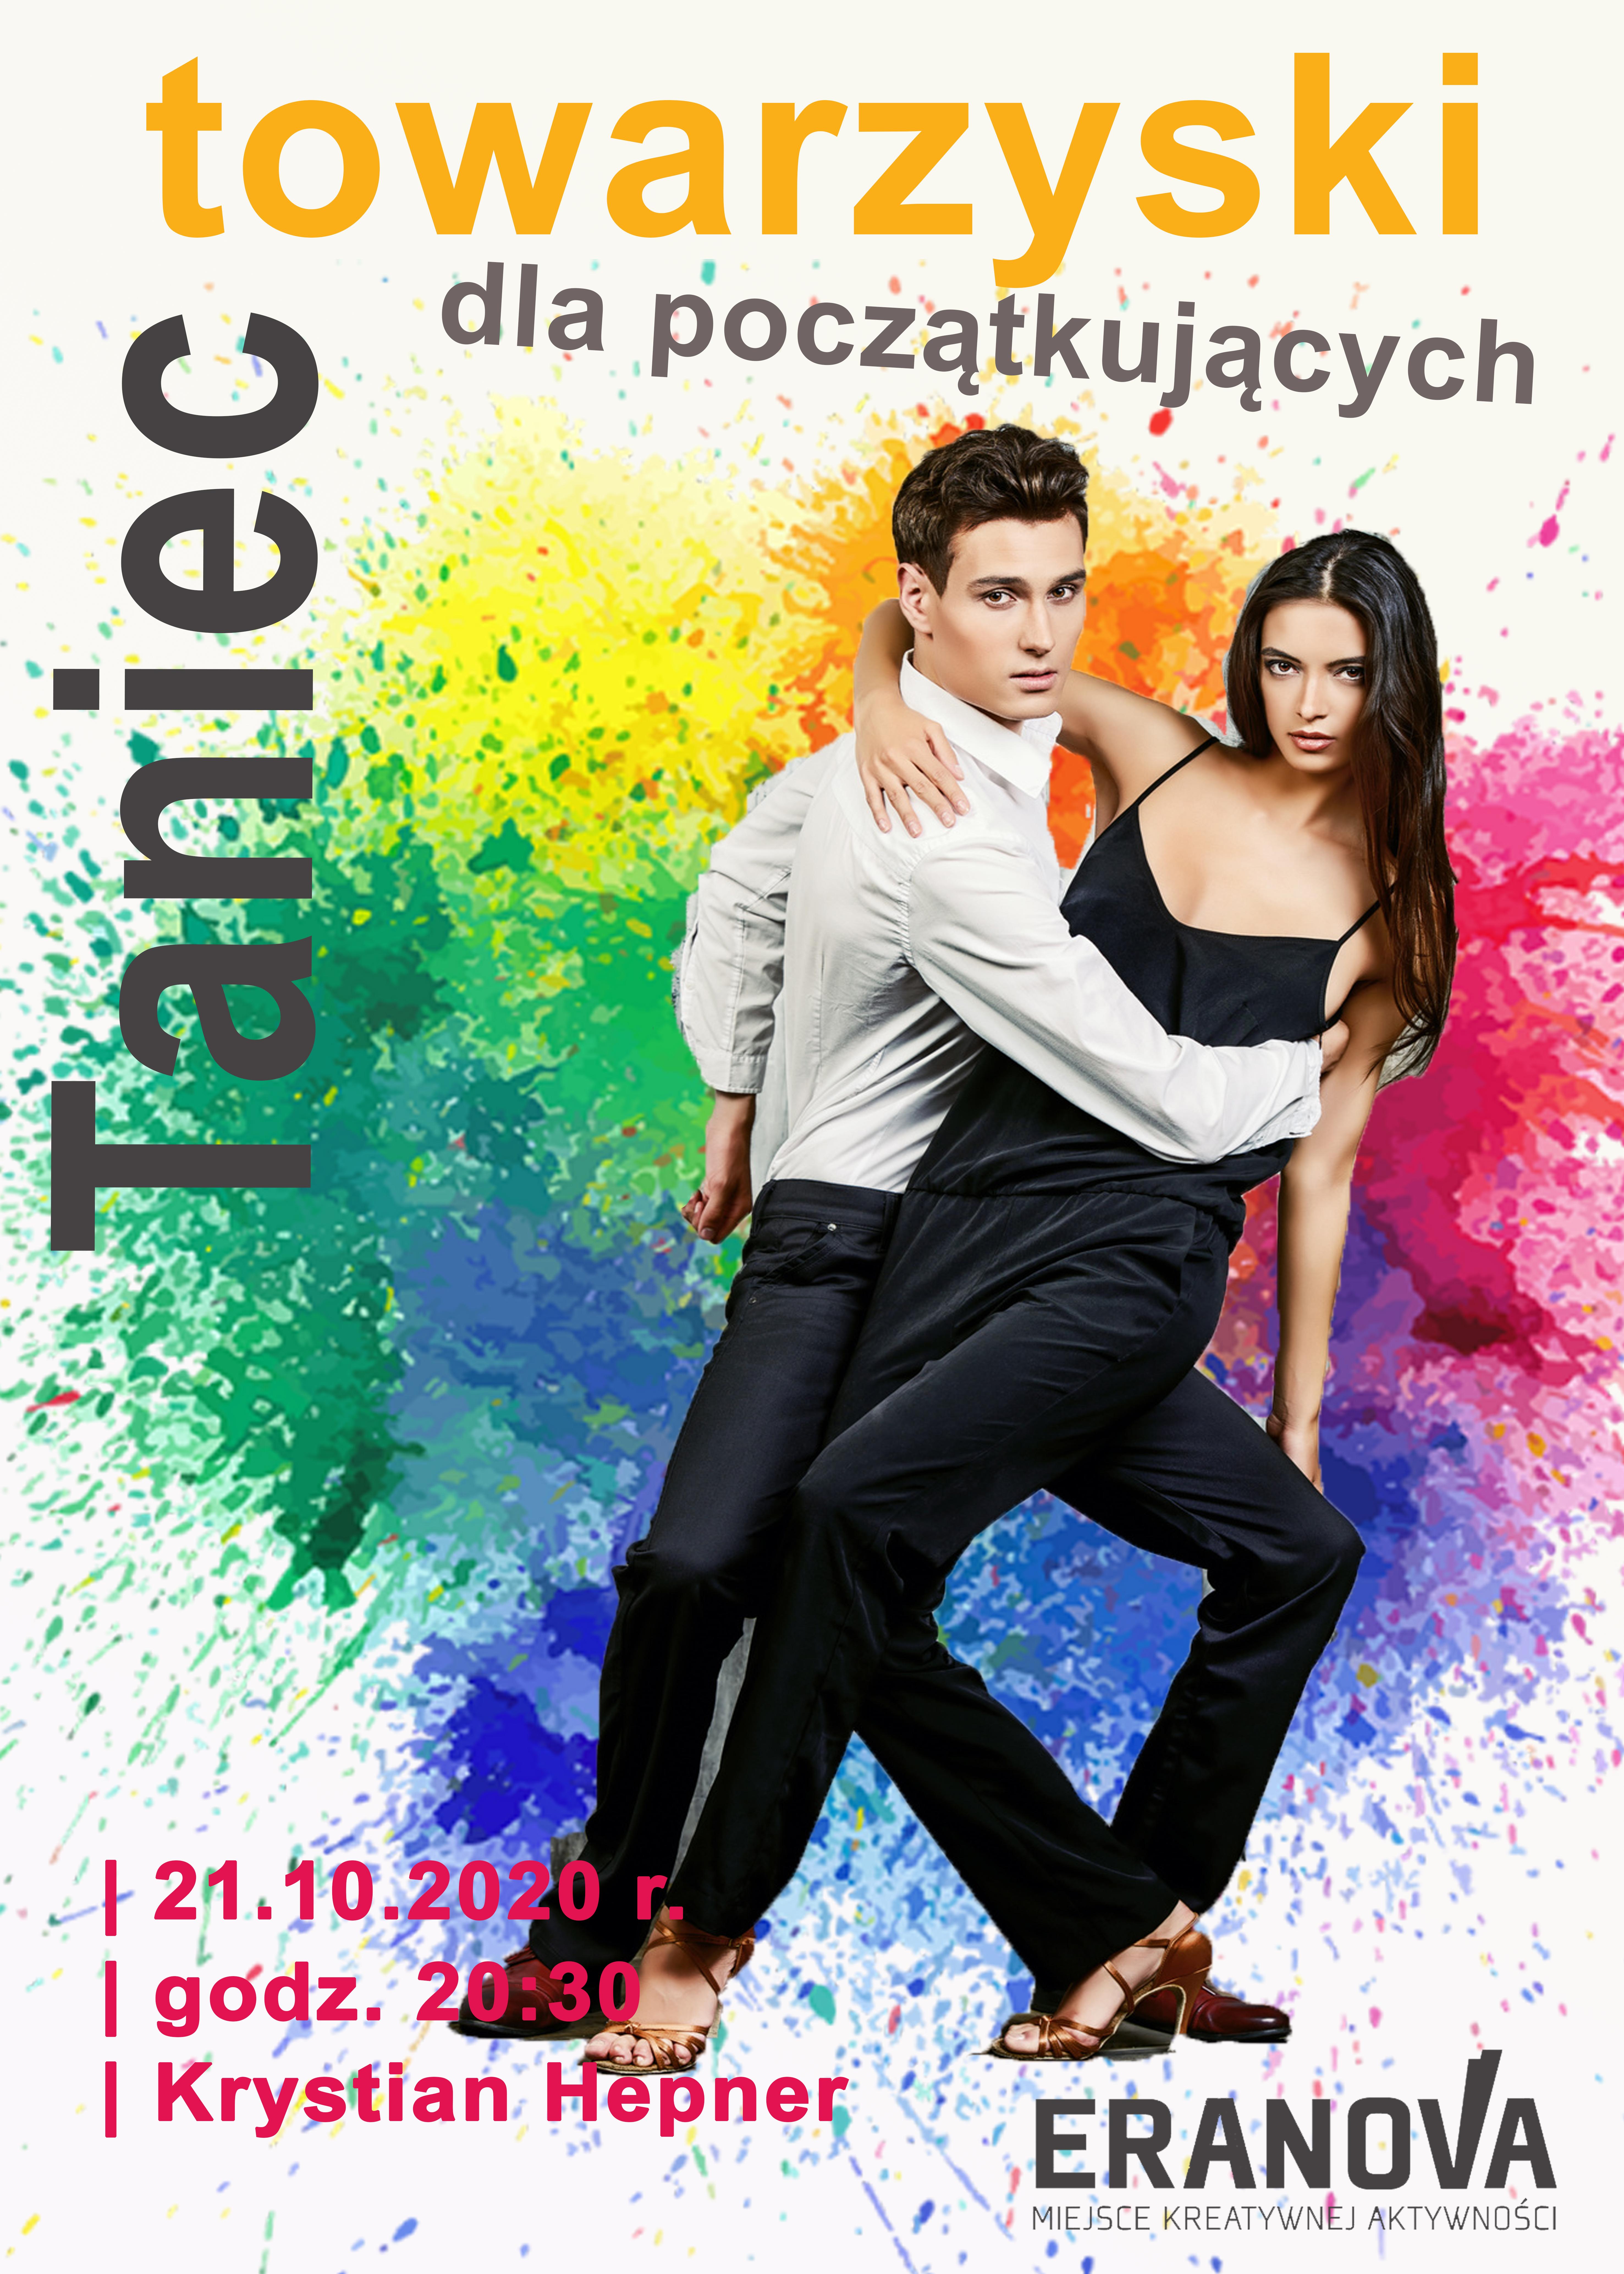 http://m.eranova.pl/2020/09/orig/towarzyski-jesien-plakat-3372.jpg